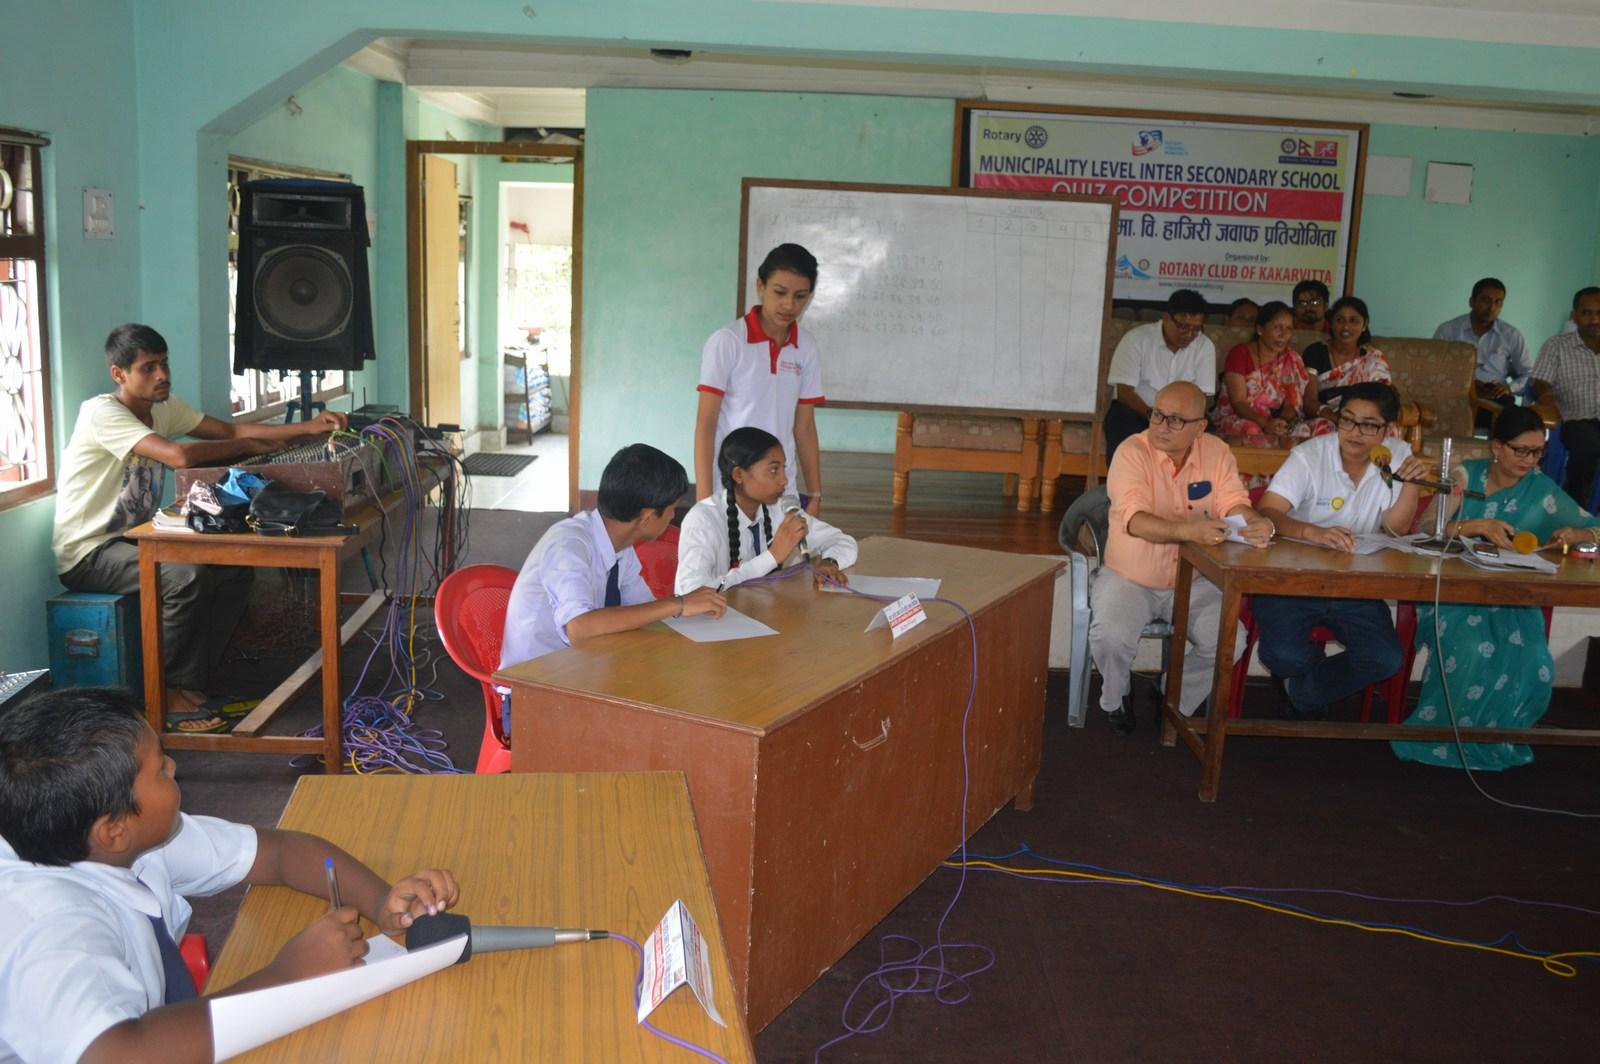 Municipality-Level-Inter-Secondary-School-Quiz-Contest-2016-Rotary-Club-of-Kakarvitta-14